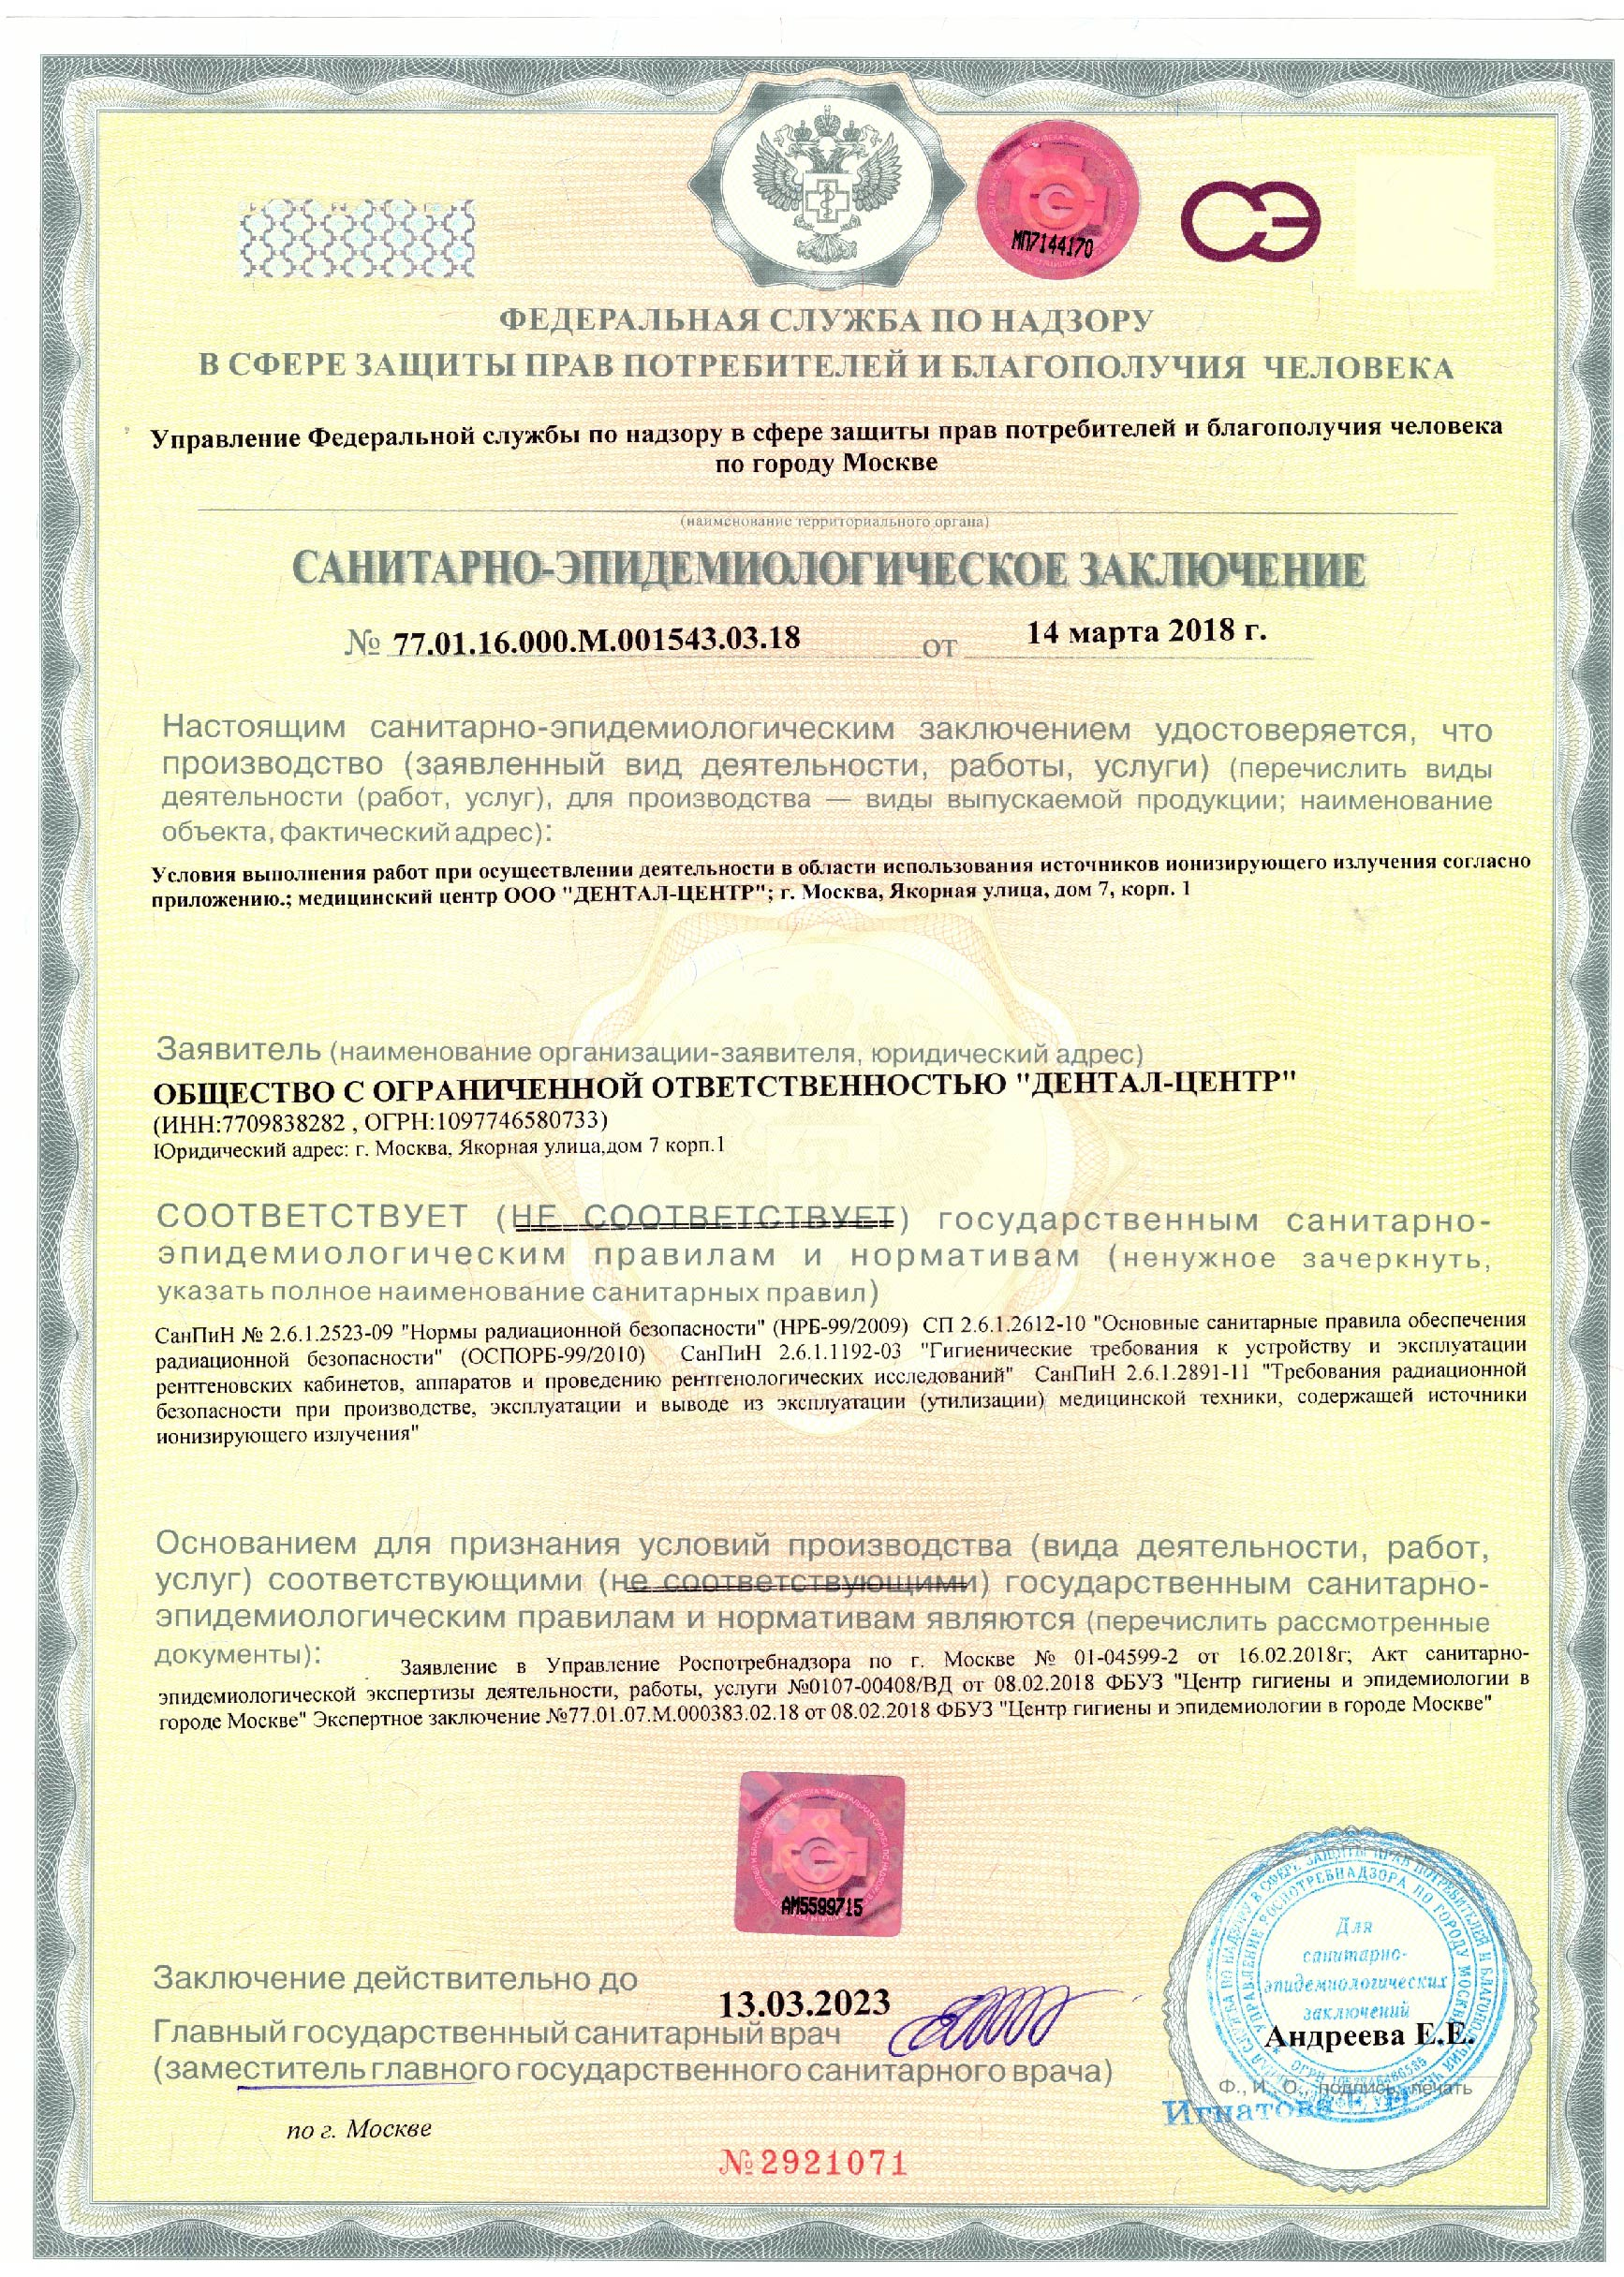 Санэпид заключению Дентал Центр-01-02